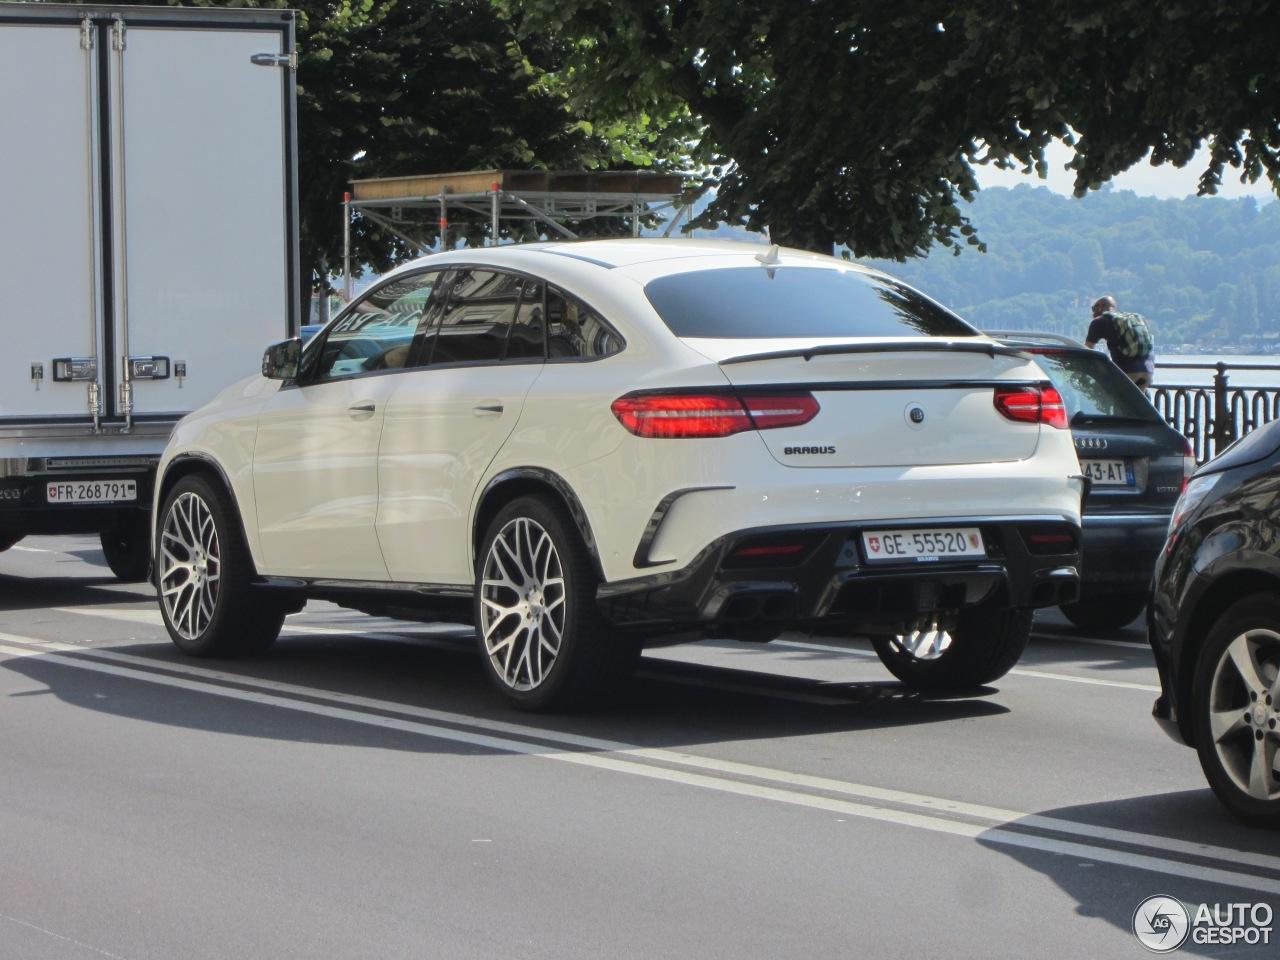 Mercedes Amg Brabus Gle 63 S Coupe 31 July 2016 Autogespot